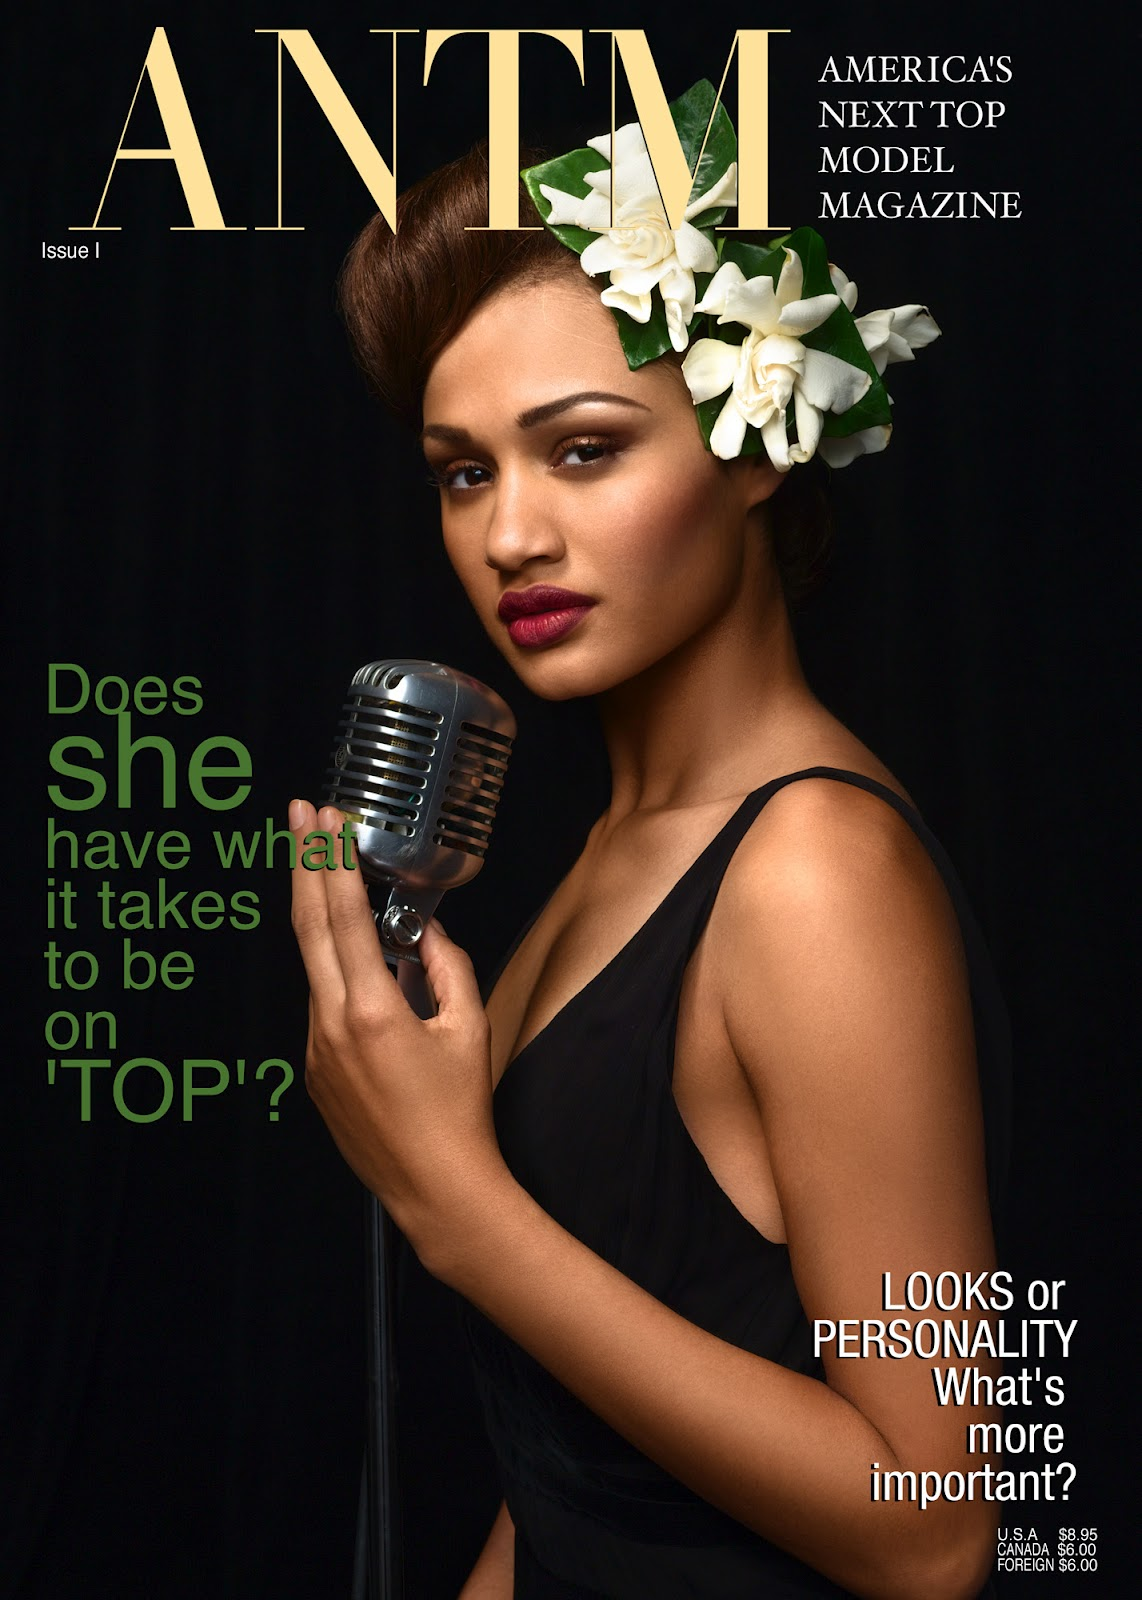 America S Best Lifechangers: Model Clicker: America's Next Top Model Cycle 2 Episode 4